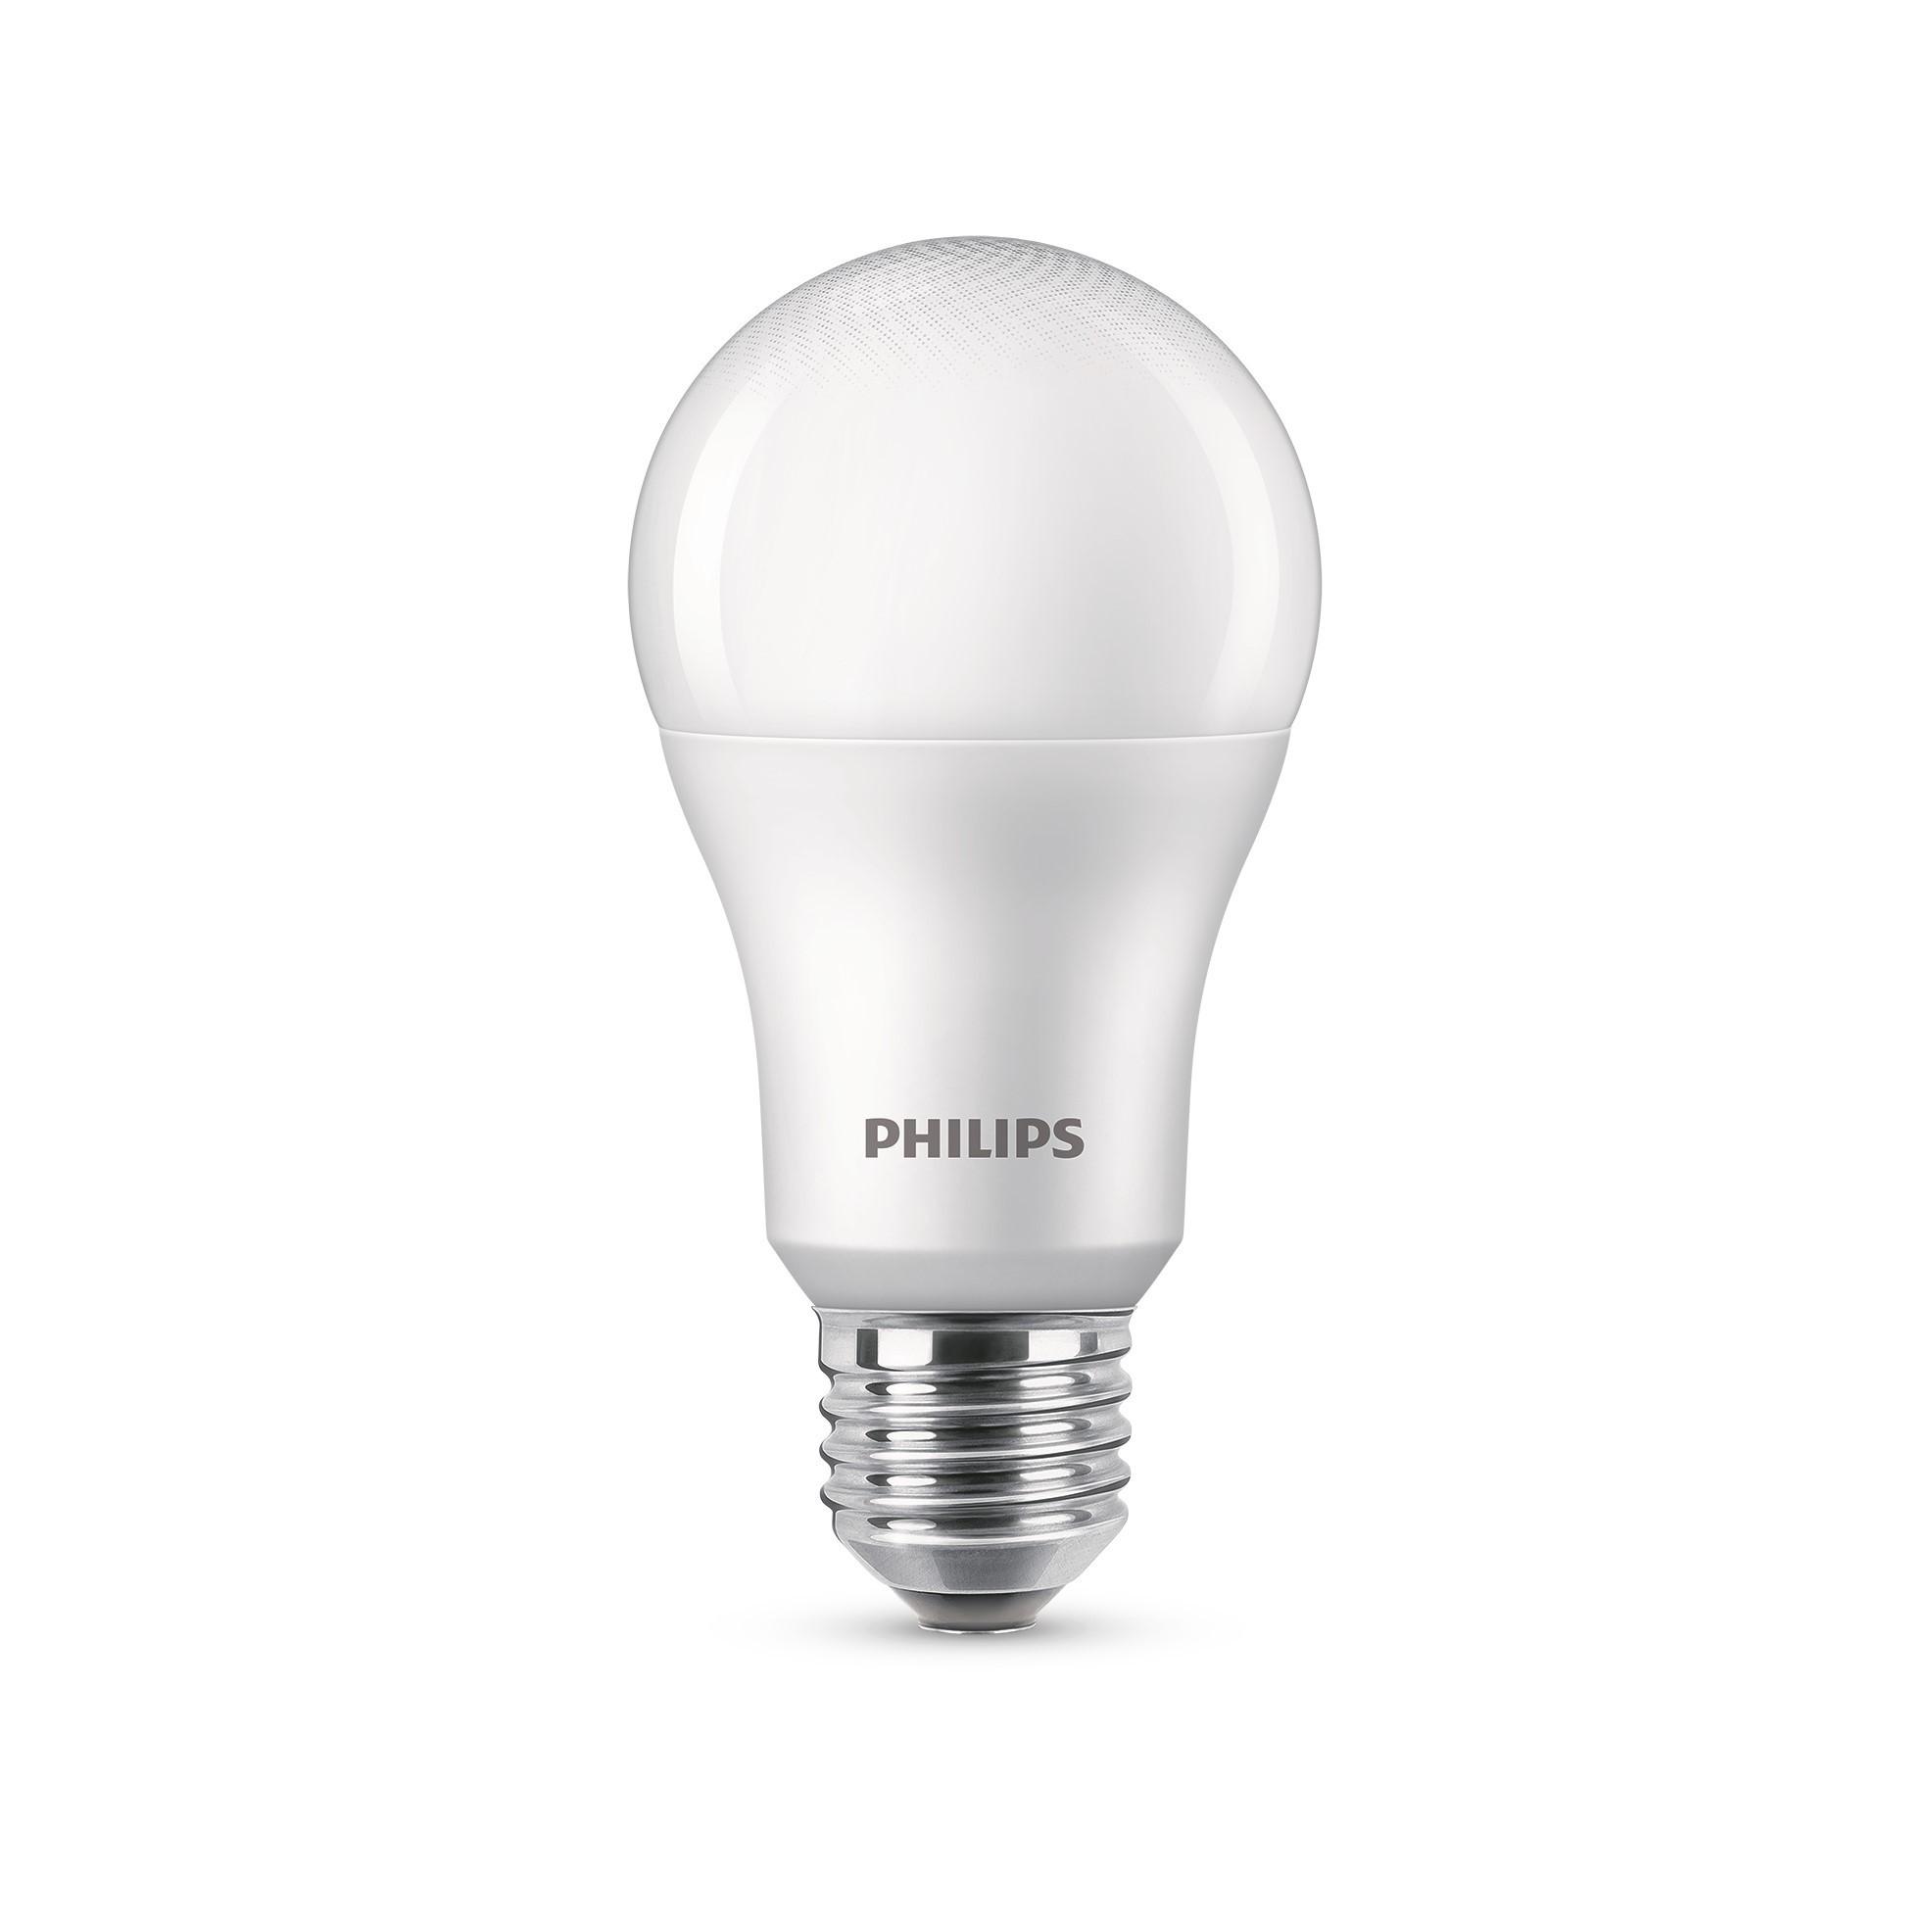 Lampada LED Philips Bulbo 11W Luz Branca E27 A65 Bivolt